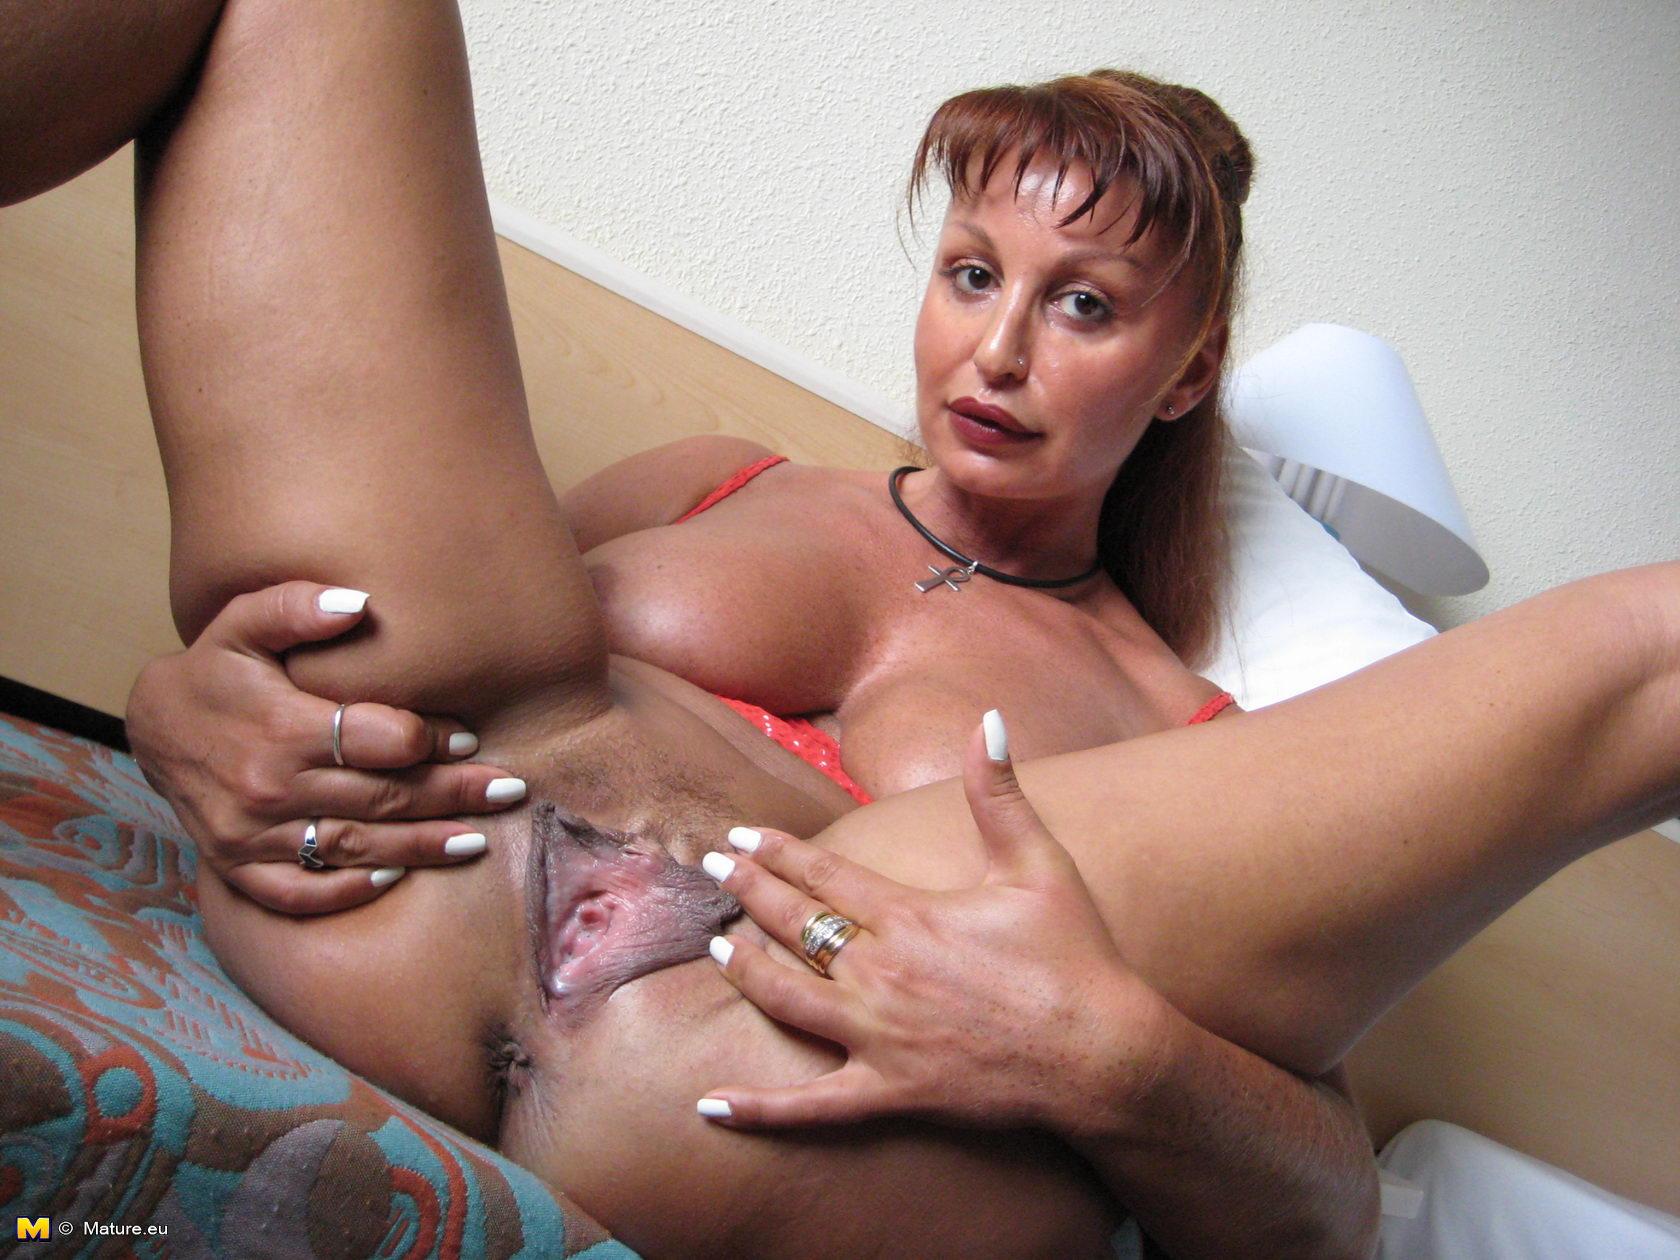 Owo sex porn videos